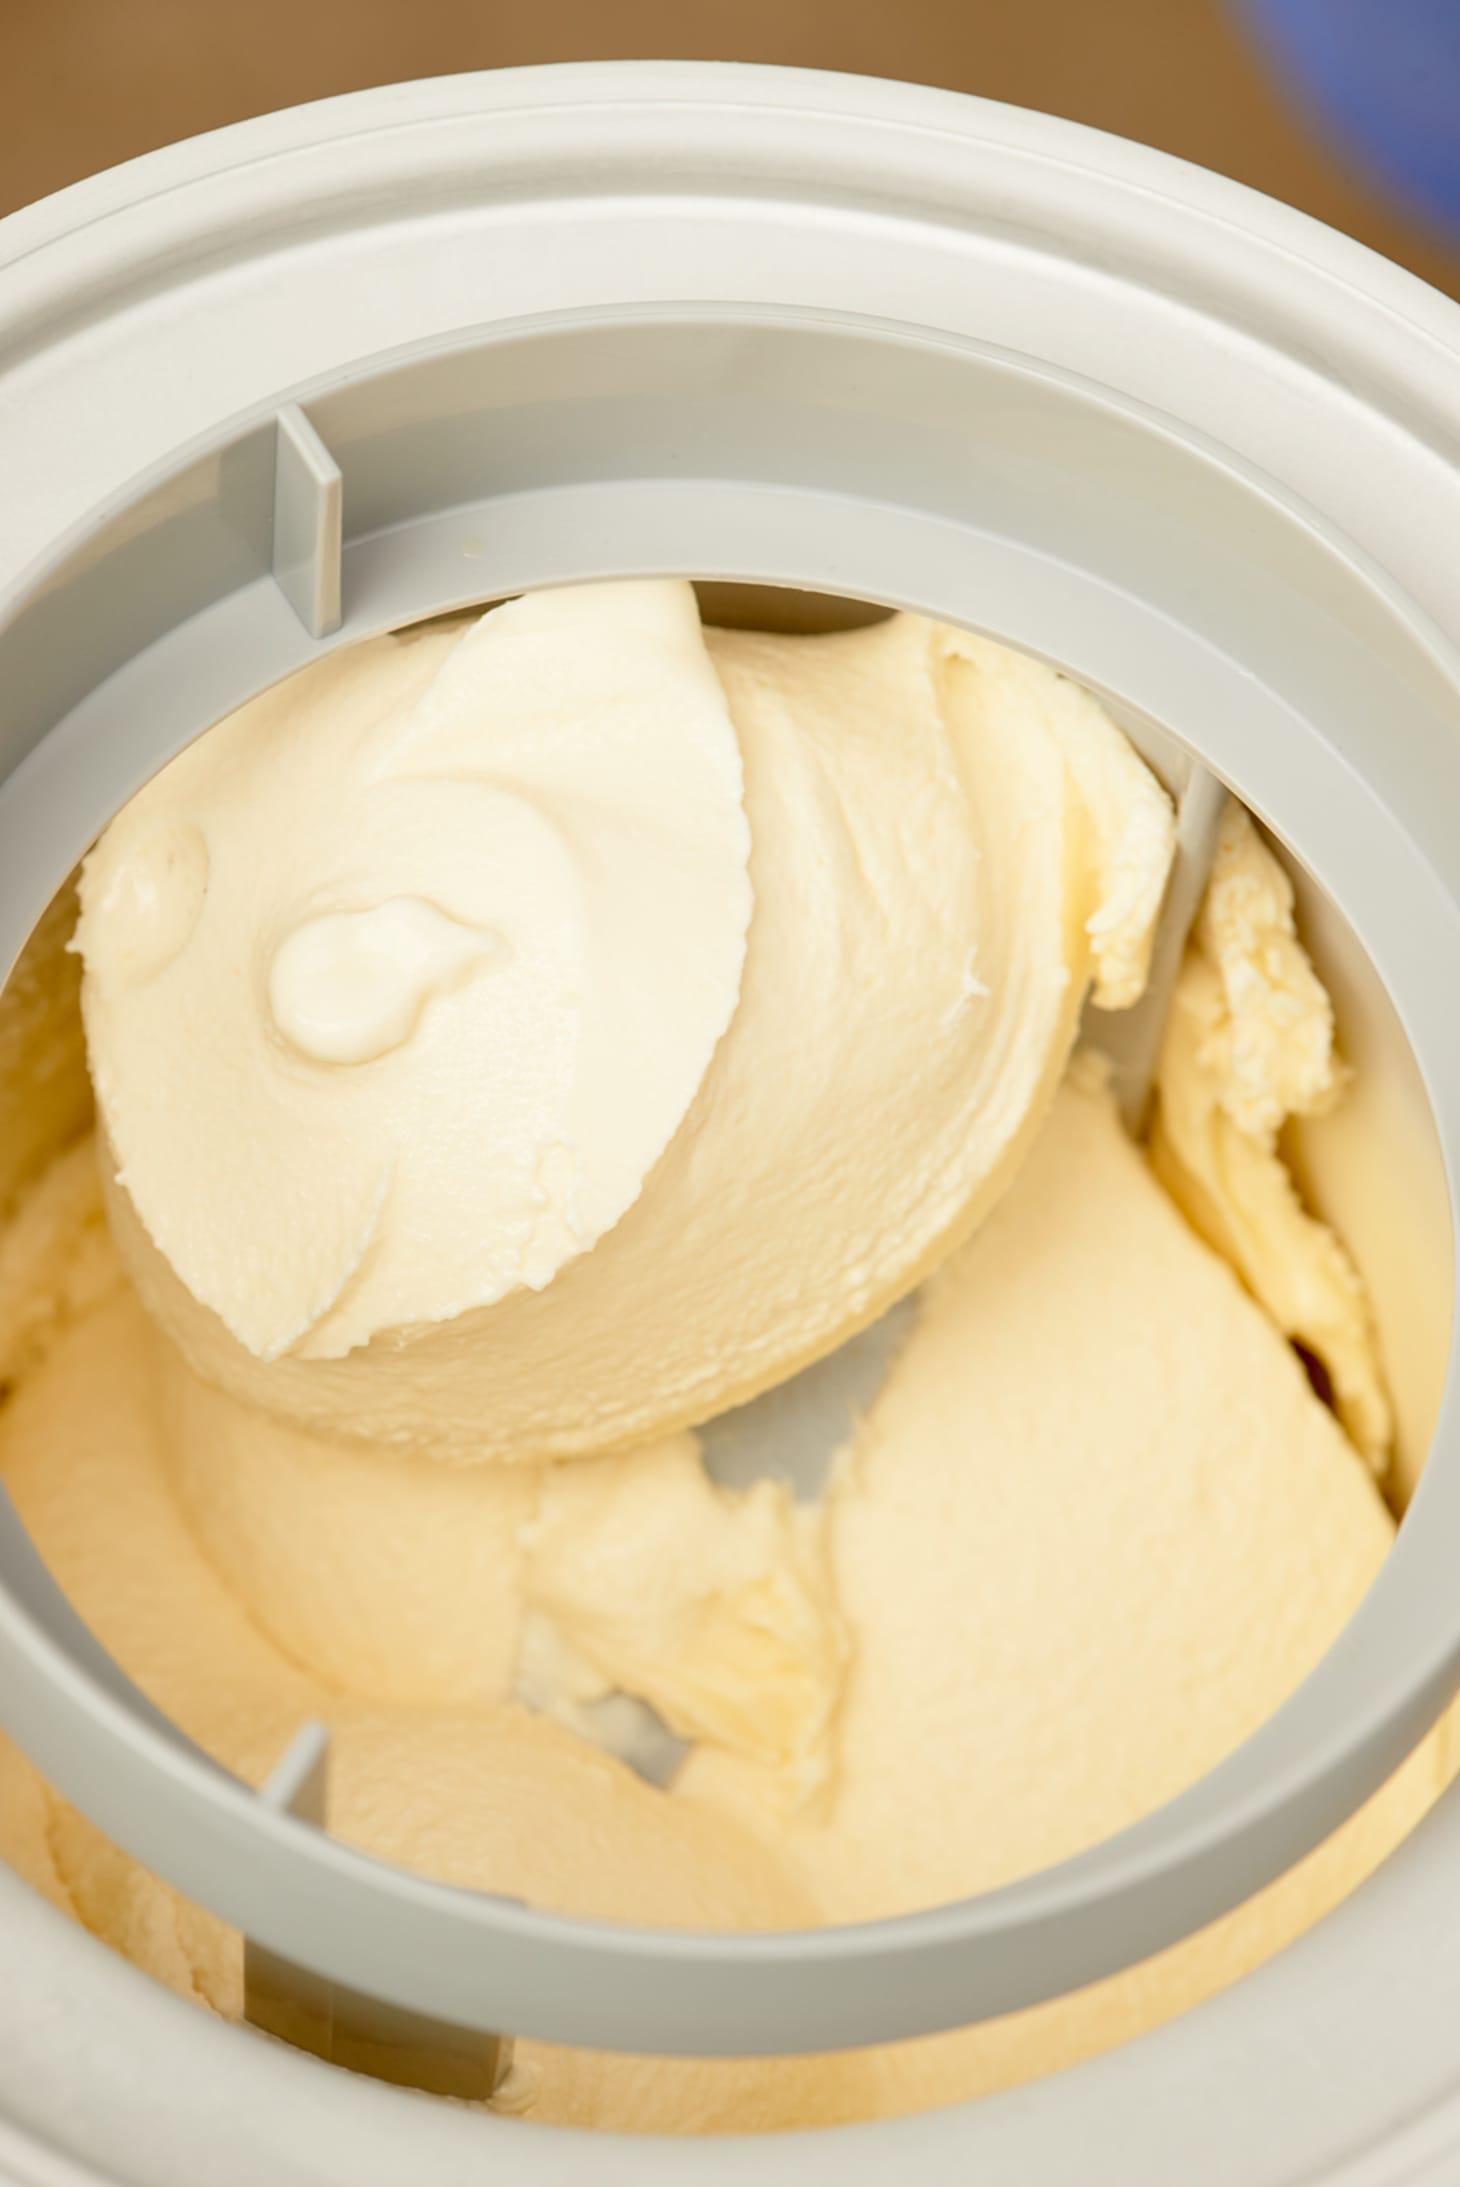 How To Make Vanilla Ice Cream